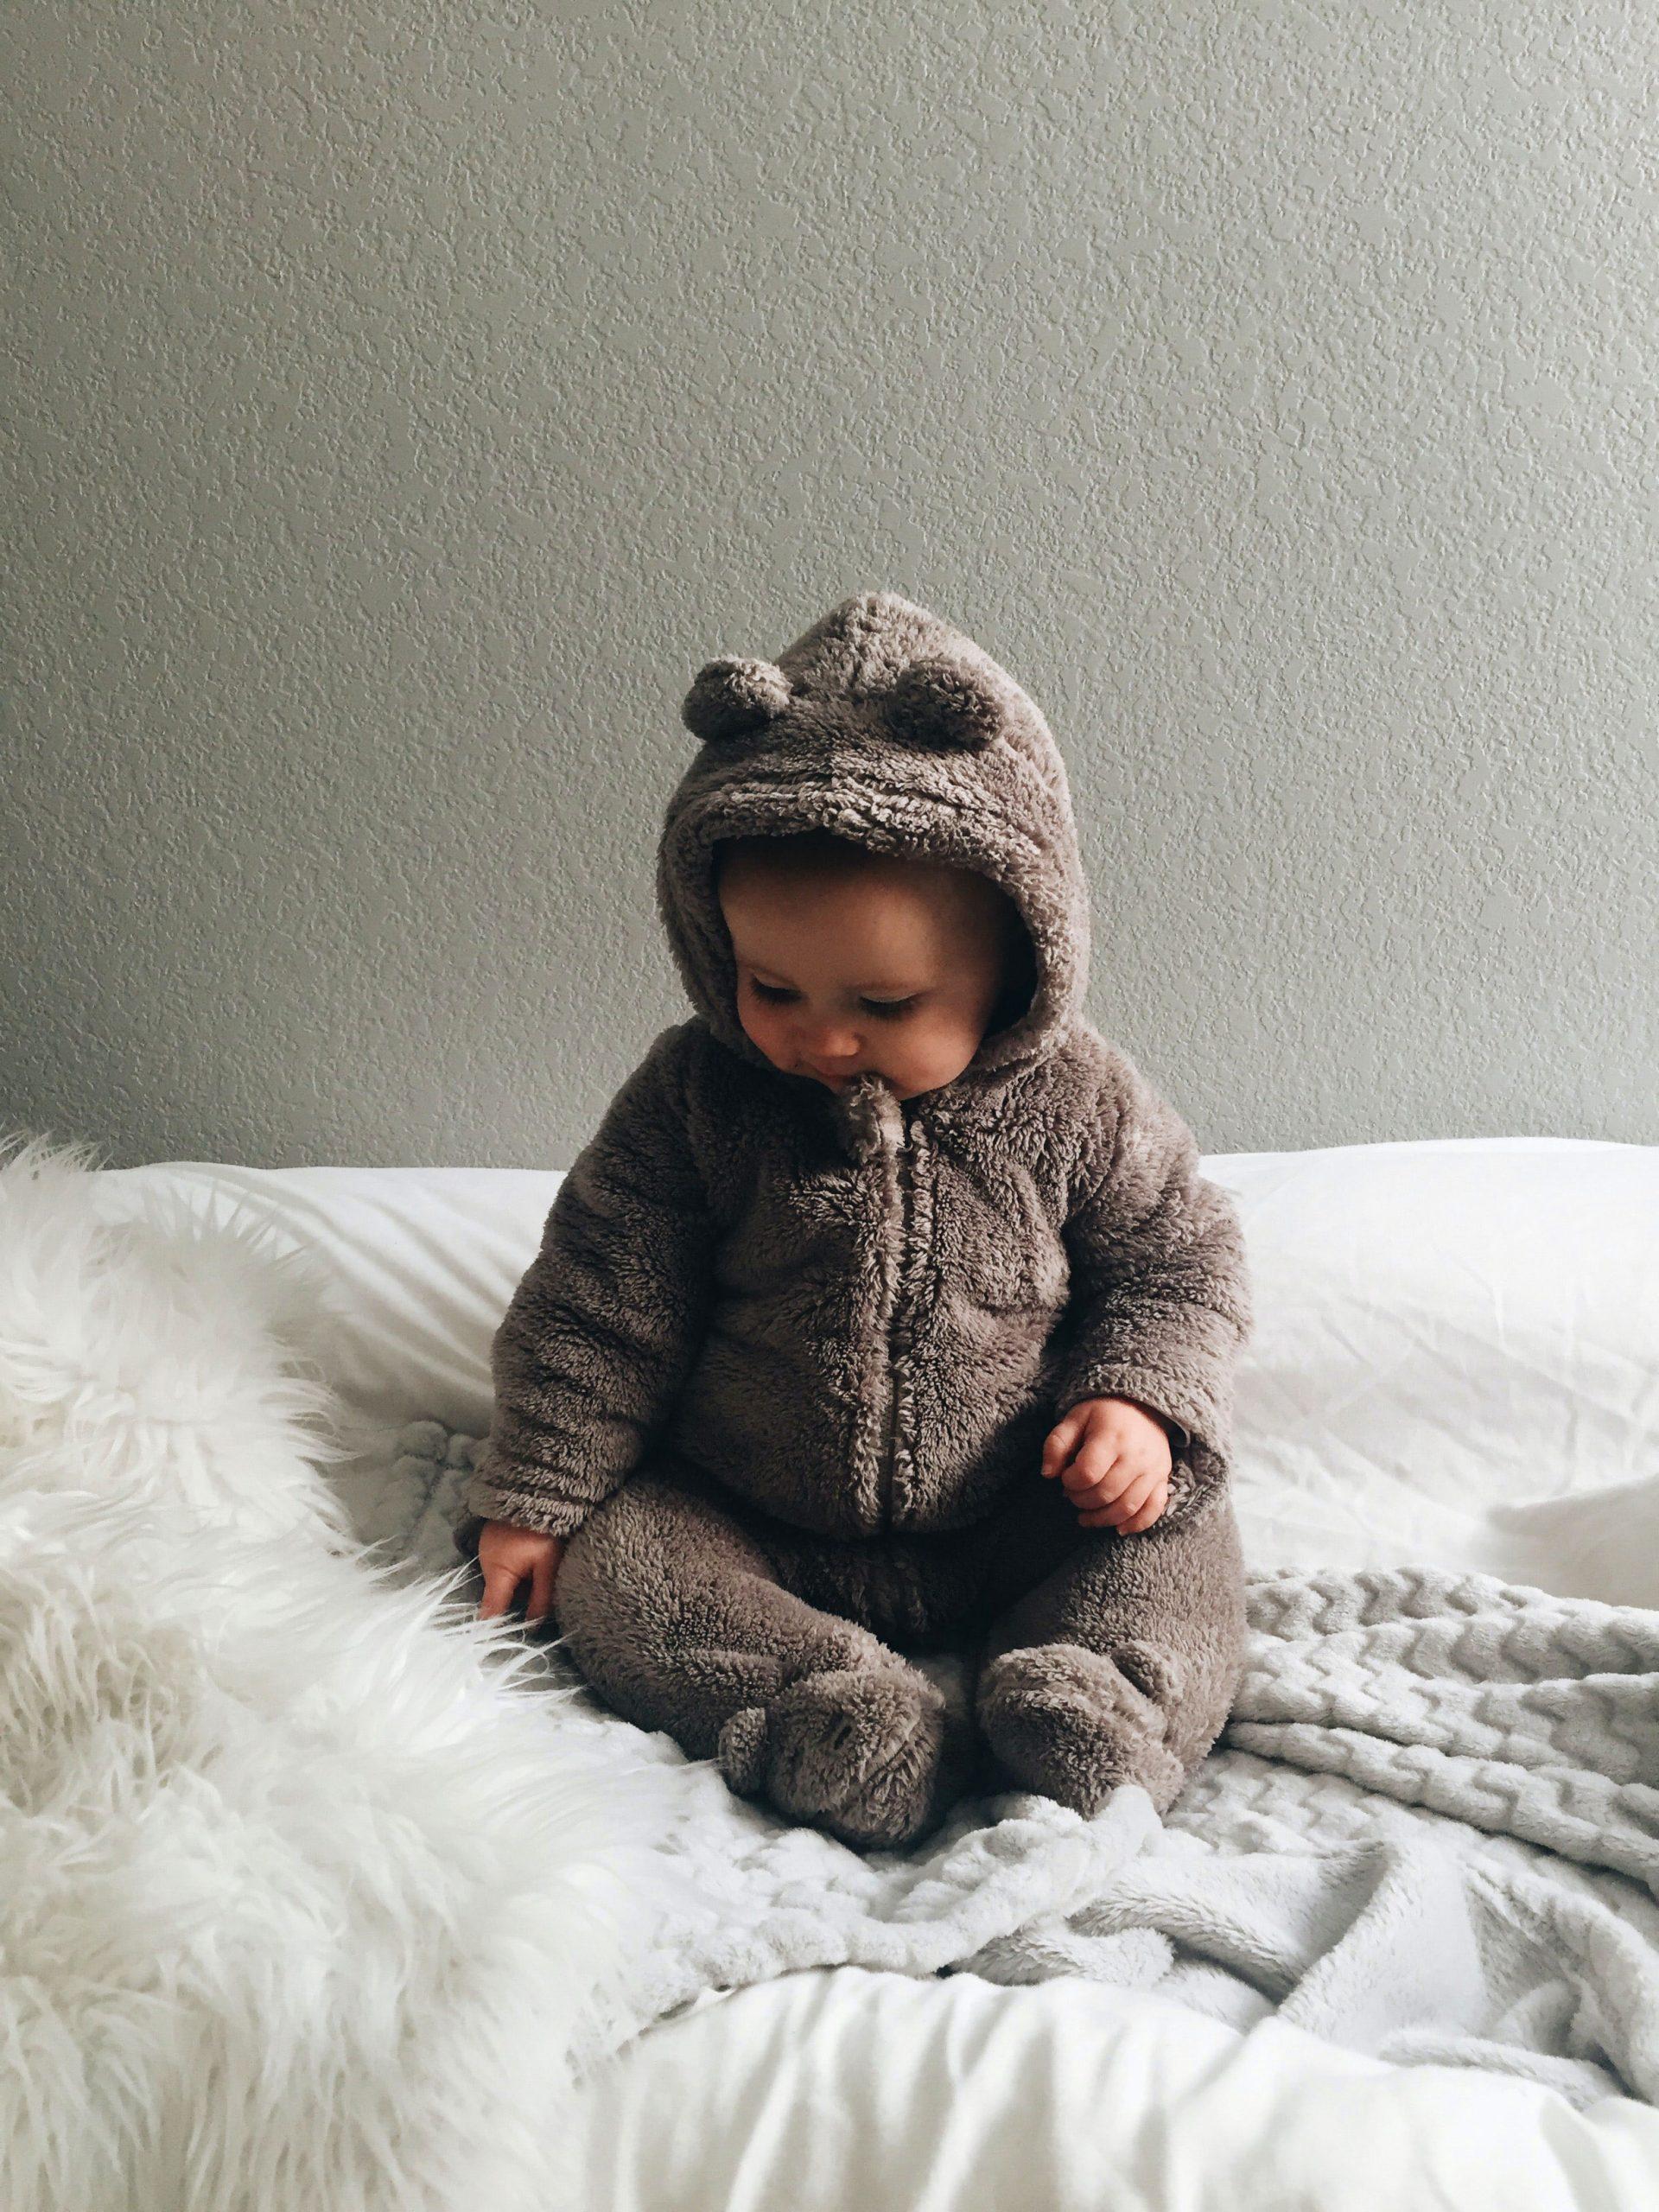 Stylish Baby Boy Whatsapp Dp Images photo gd